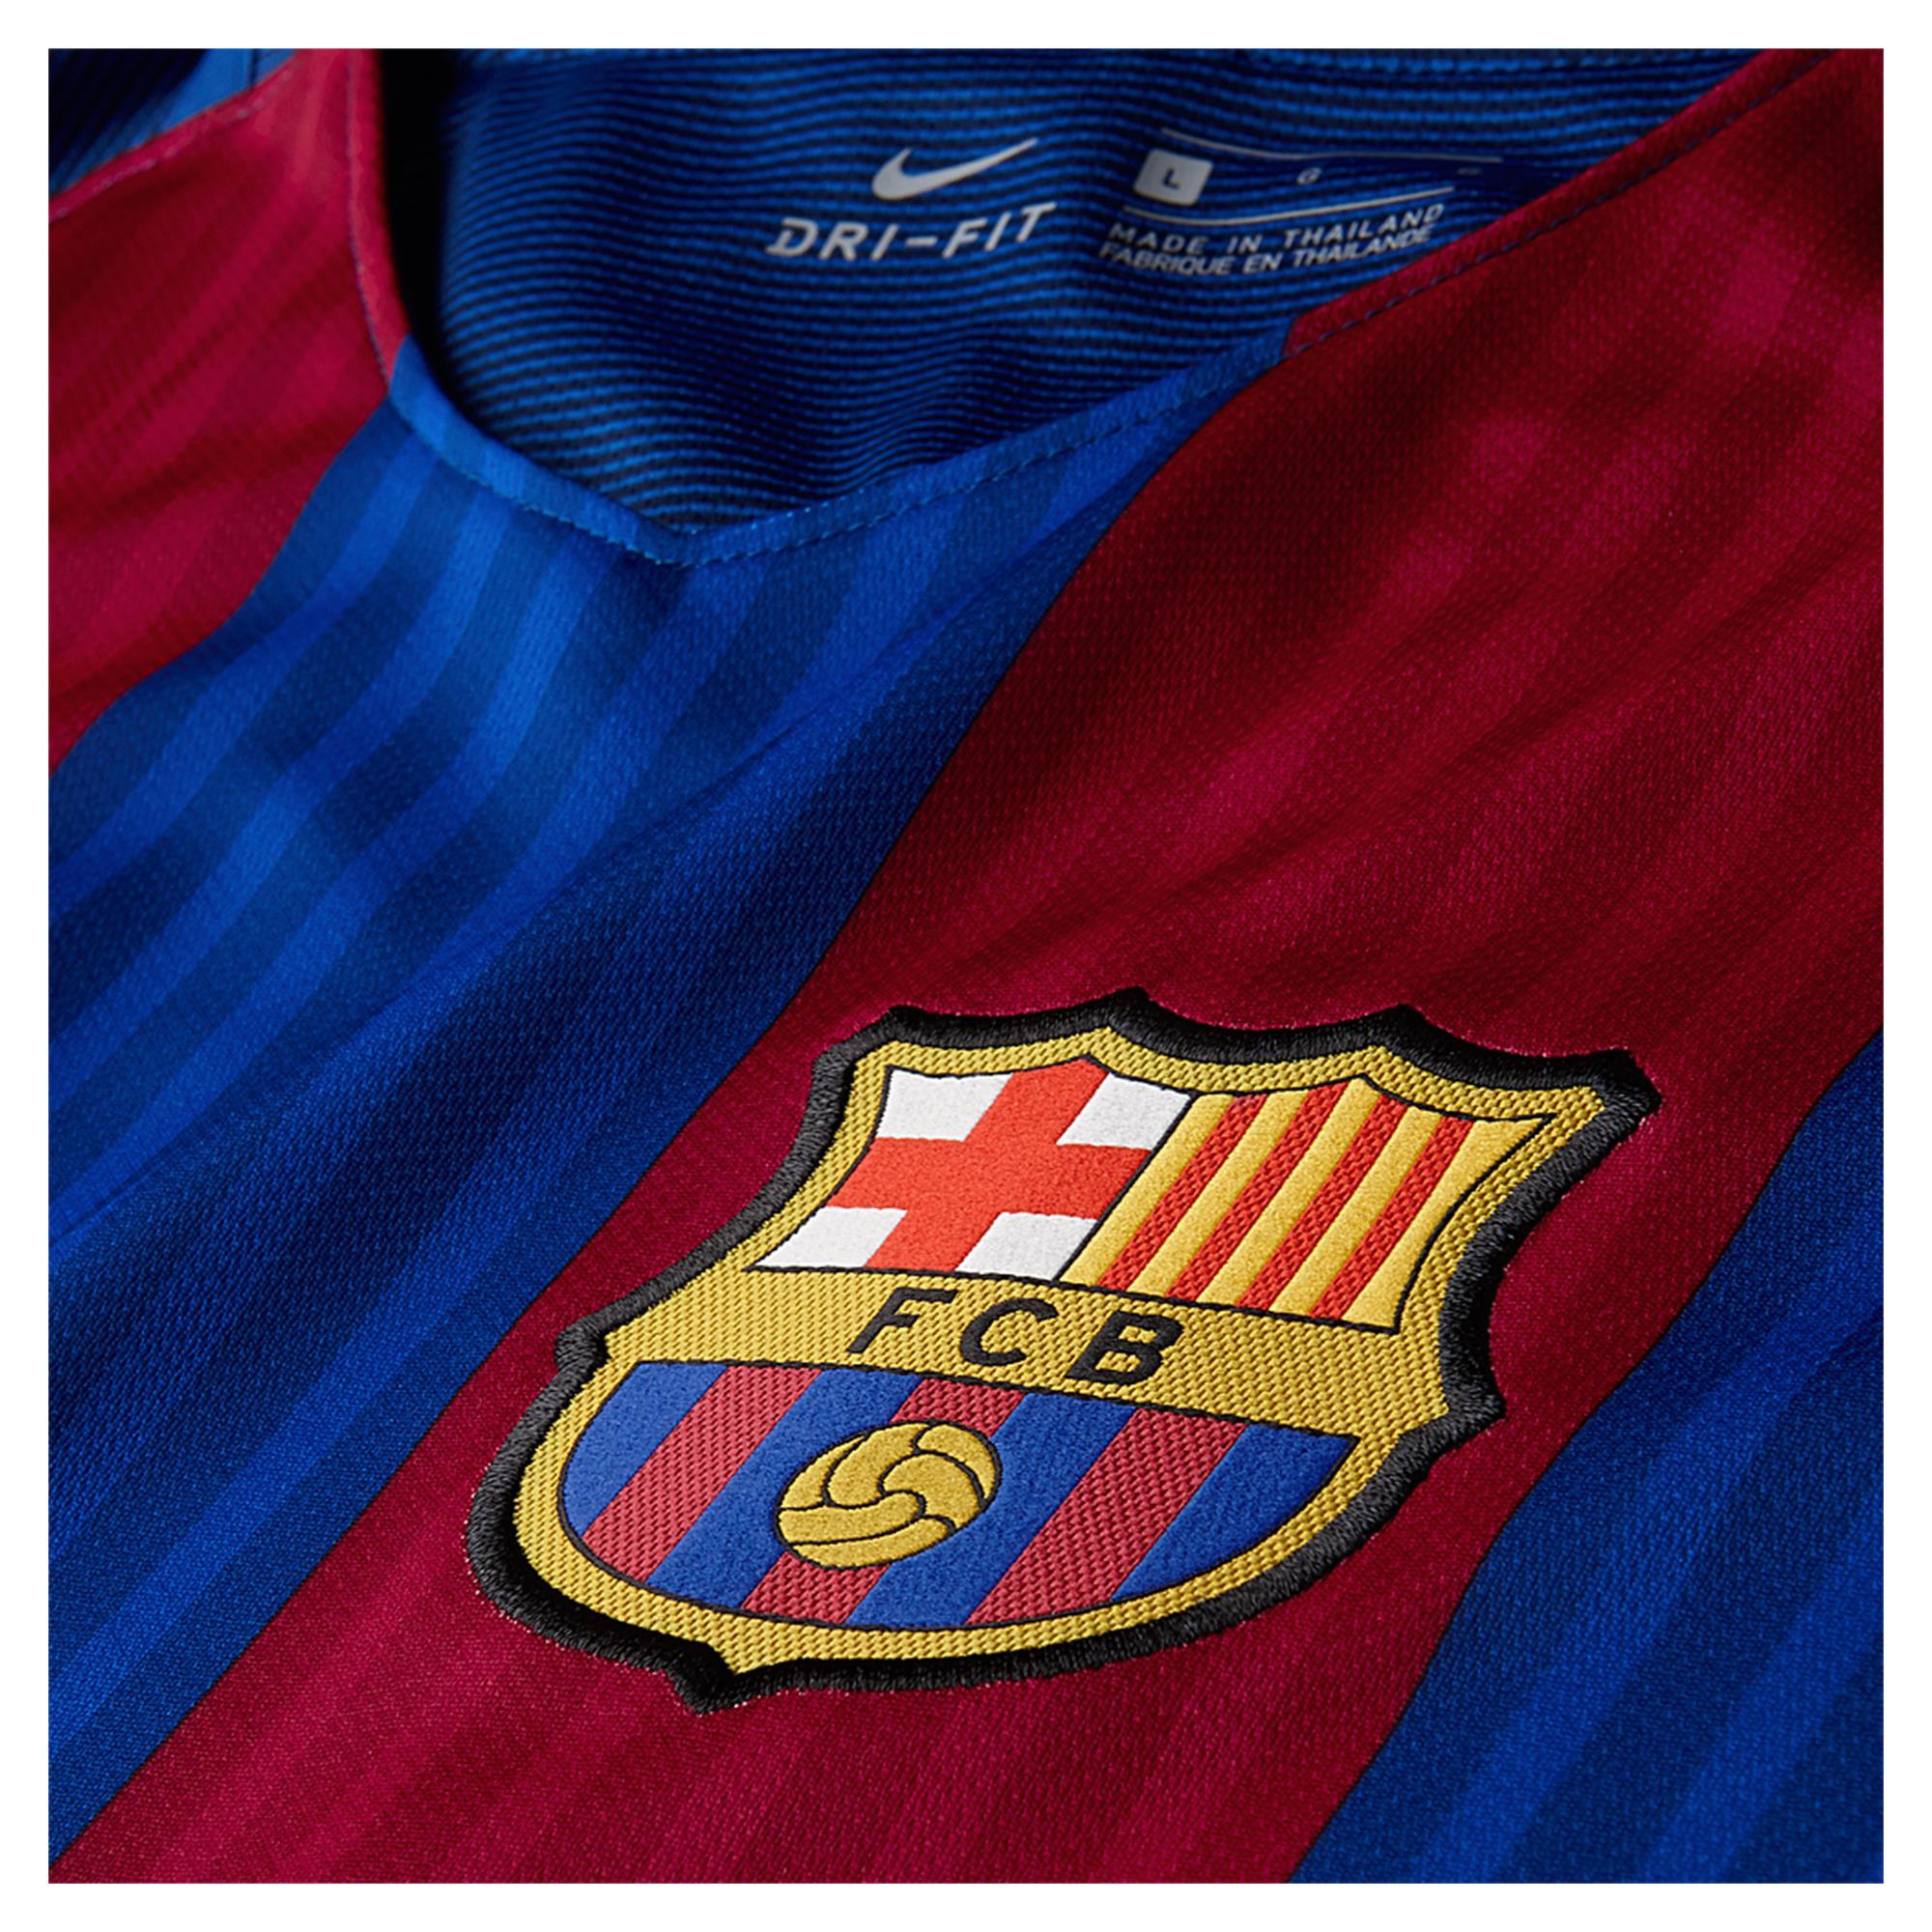 f347c45e1c Camisa Barcelona I 2016 2017 - Nike Torcedor Masculina - Camarote do  Torcedor